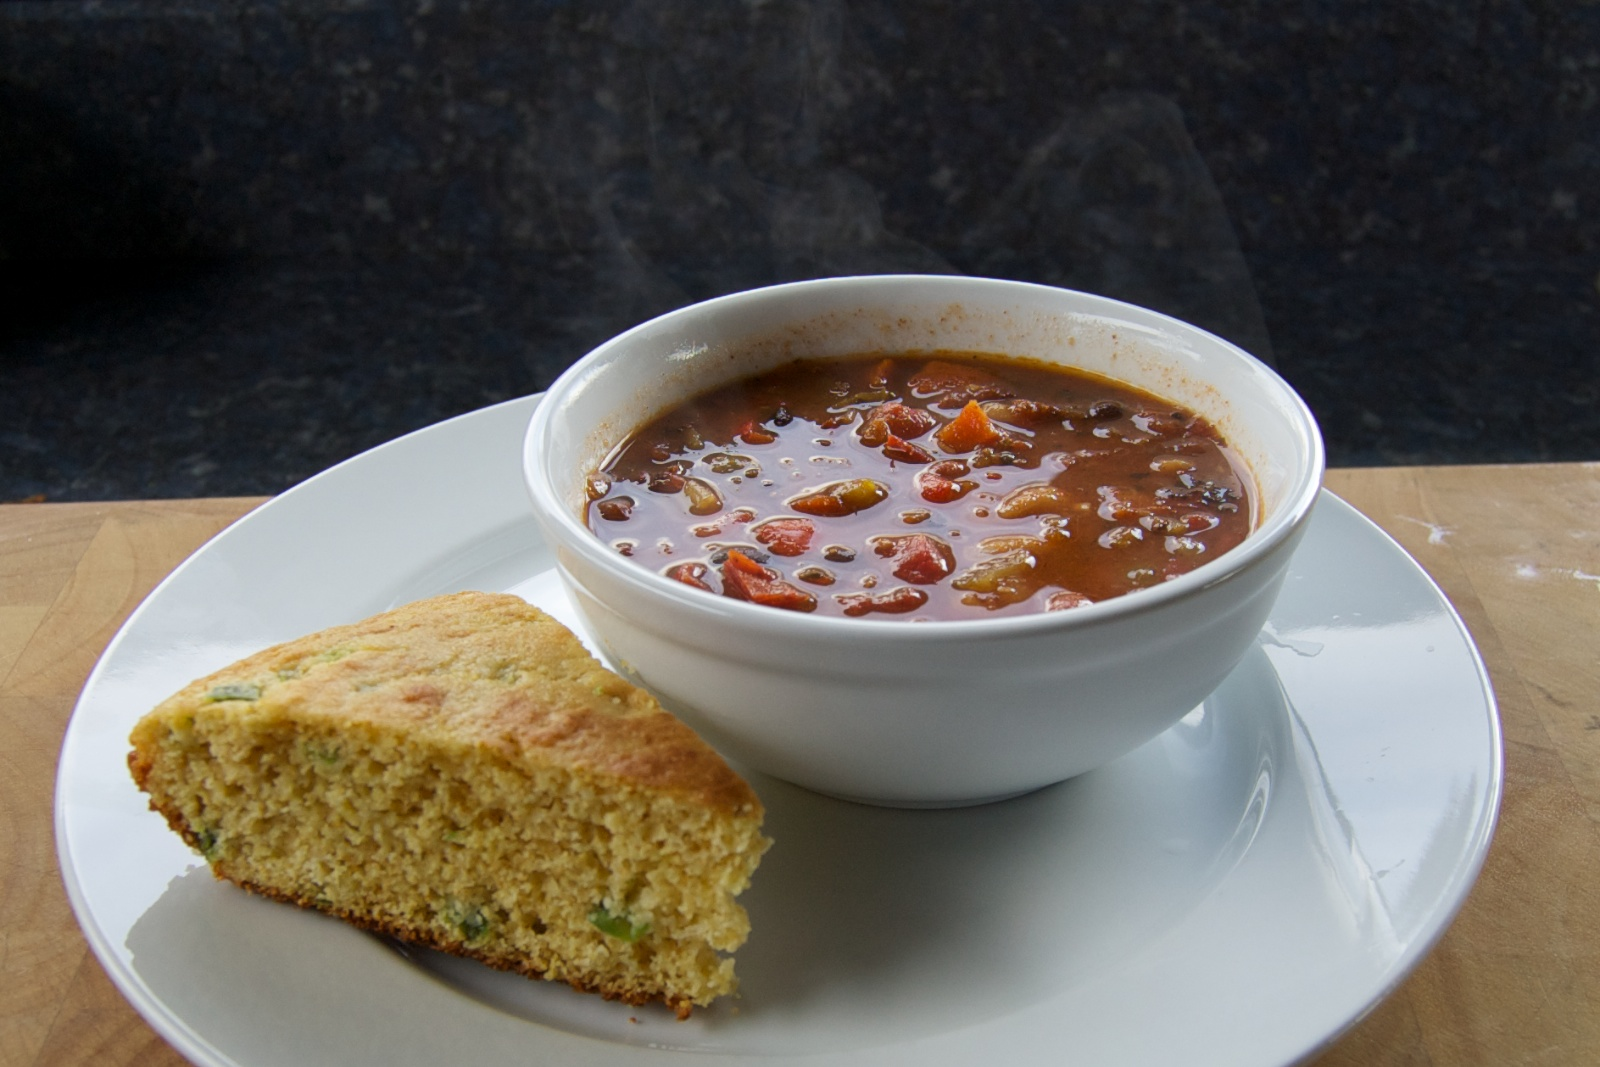 http://blog.rickk.com/food/2011/11/29/ate.2011.11.29.l.jpg